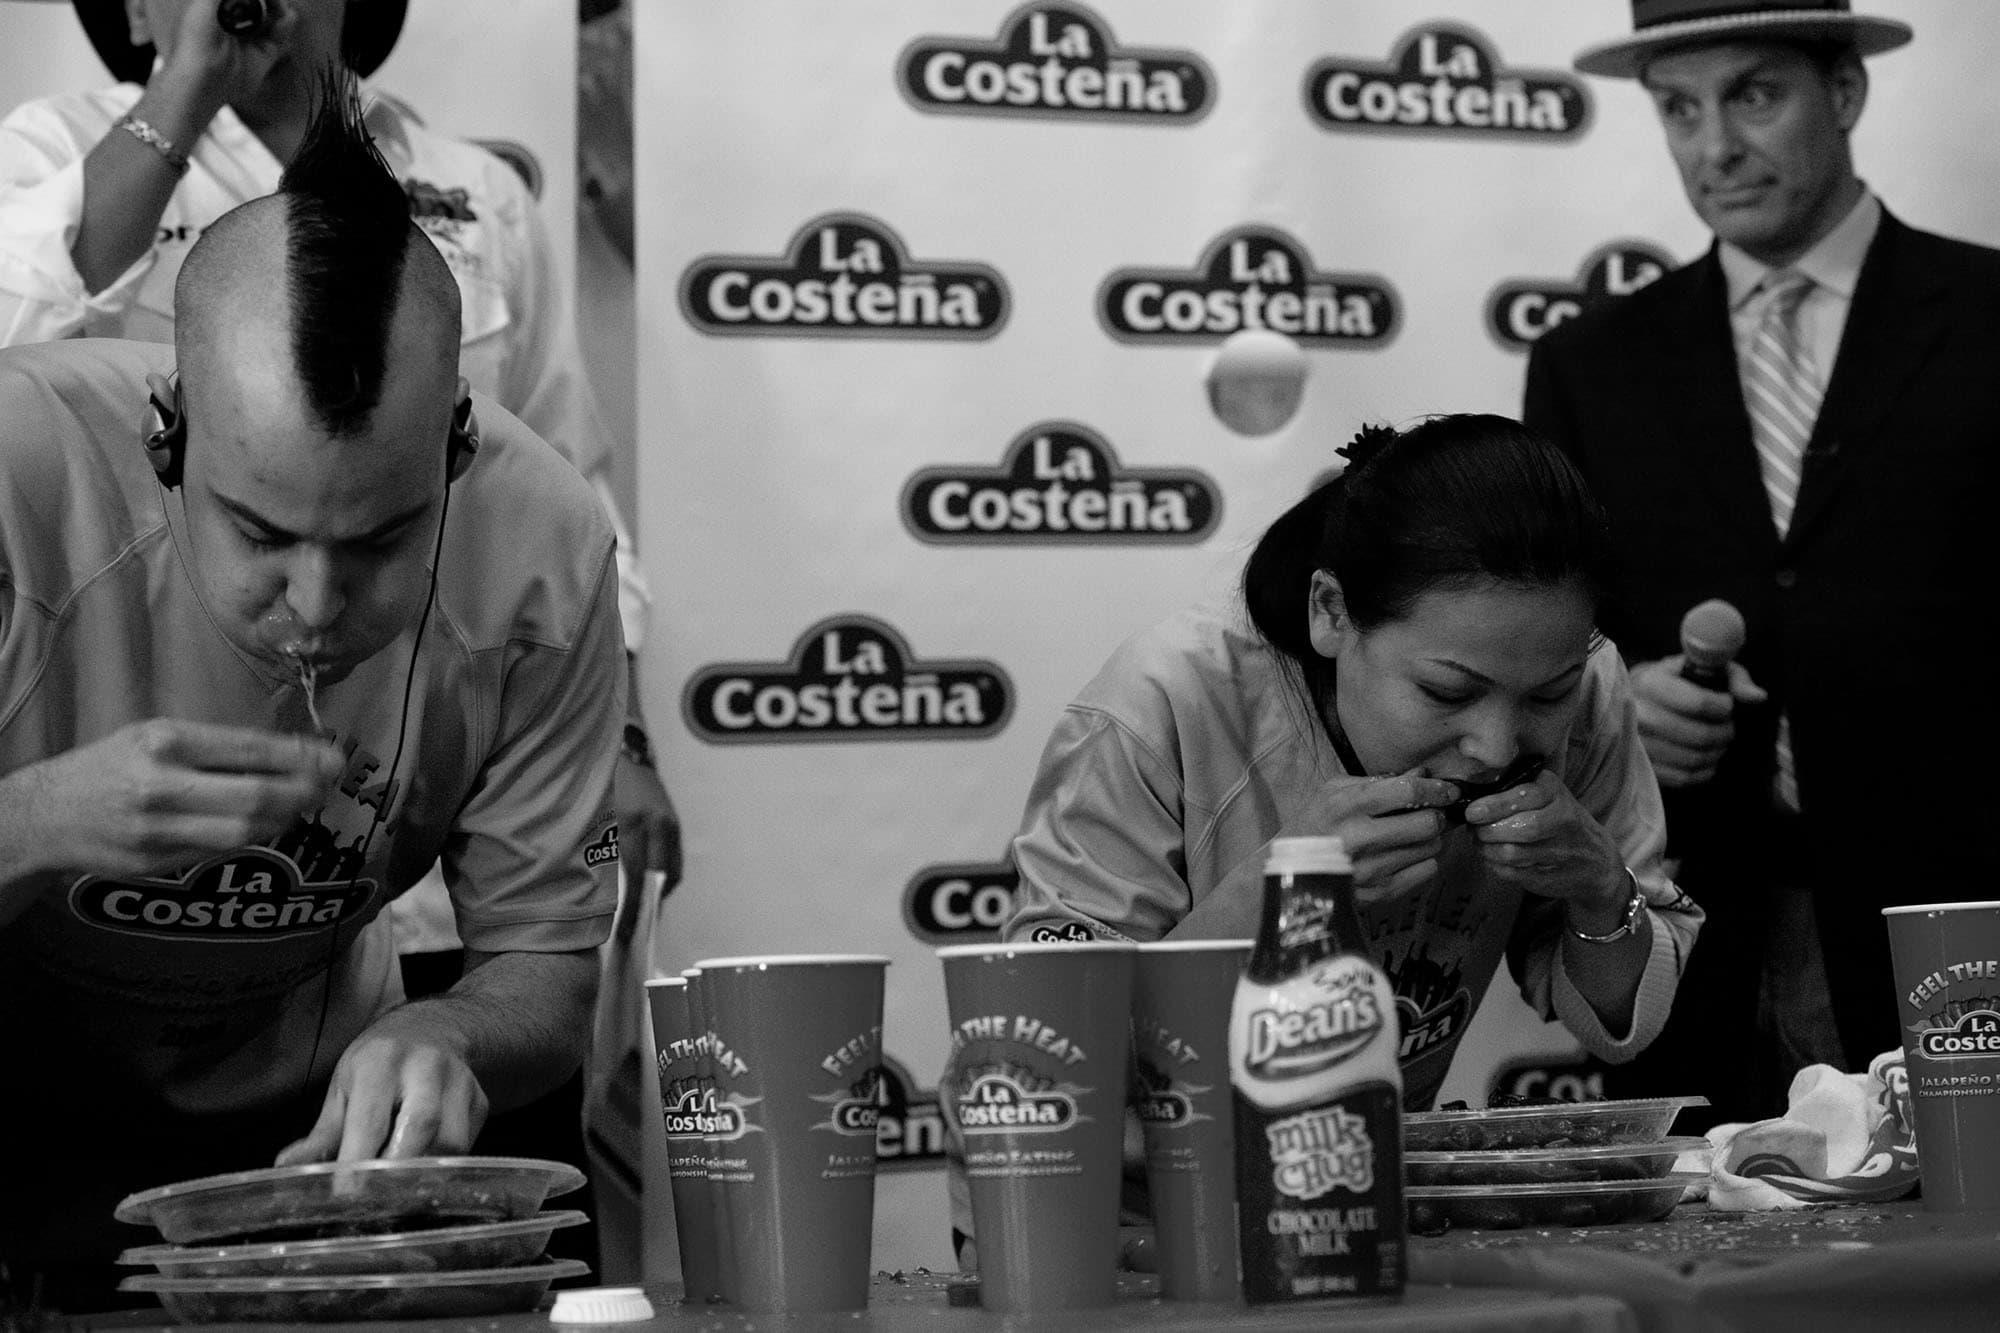 La Costena Jalapeno Eating Contest in Chicago, Illinois.